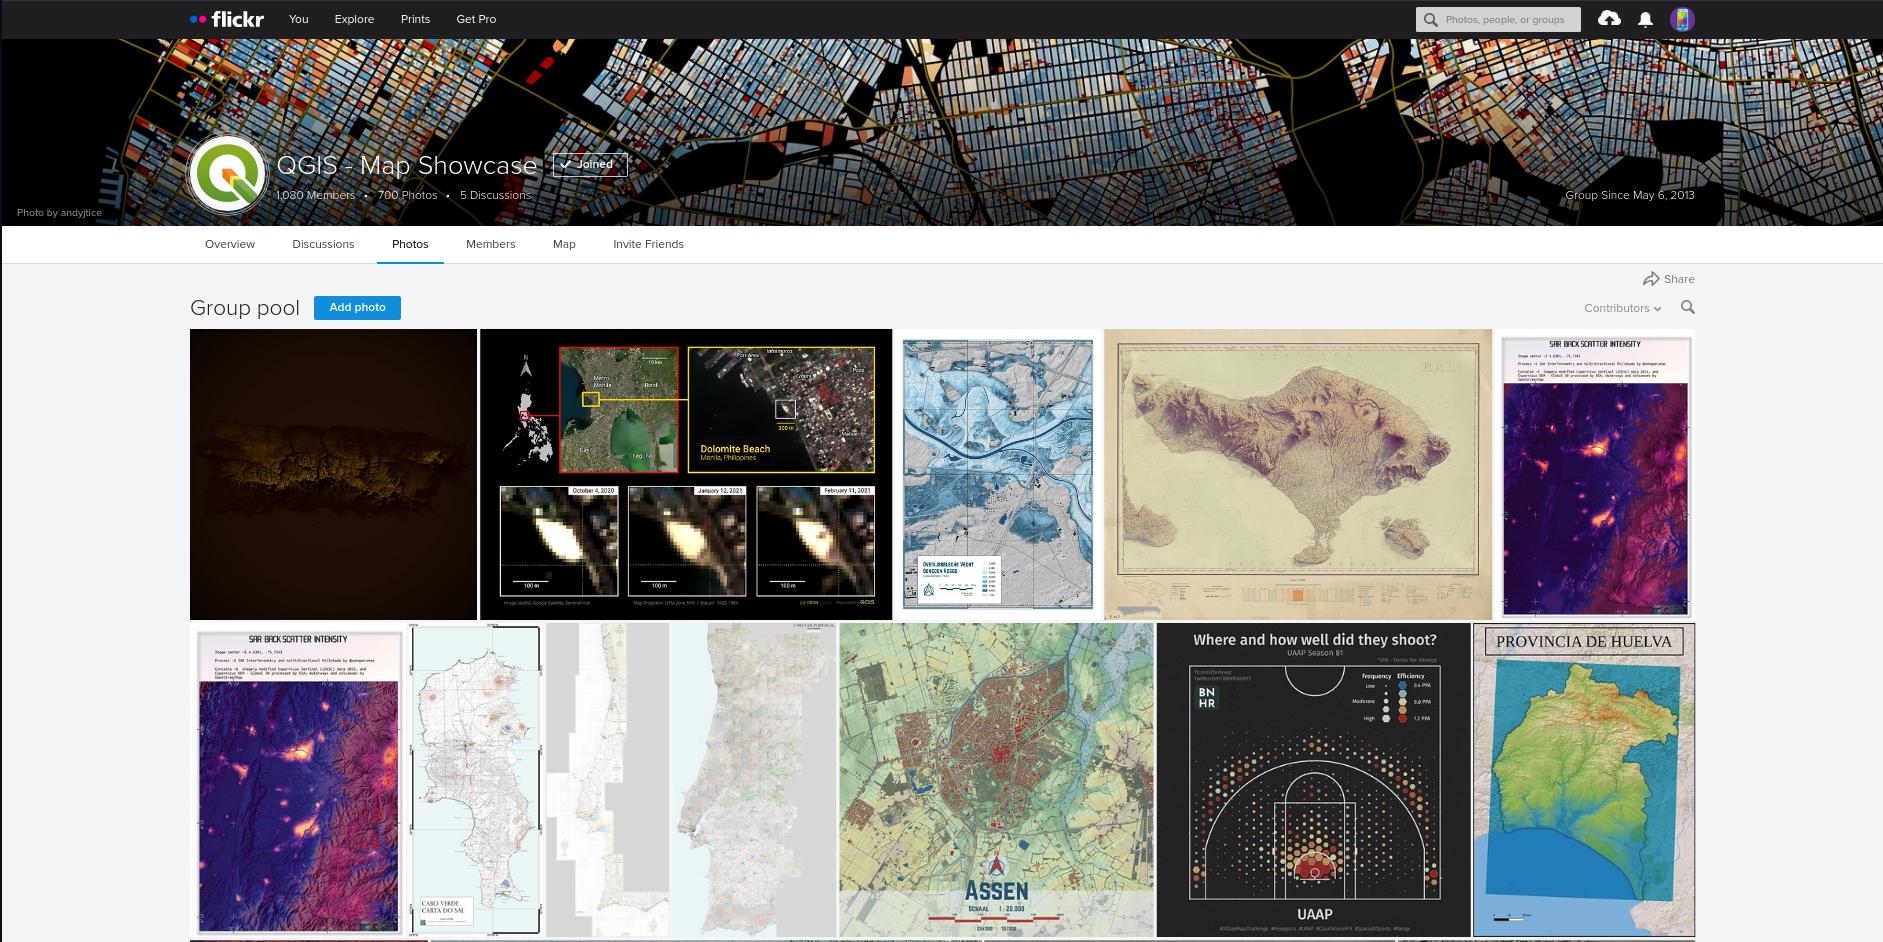 QGIS Map Showcase